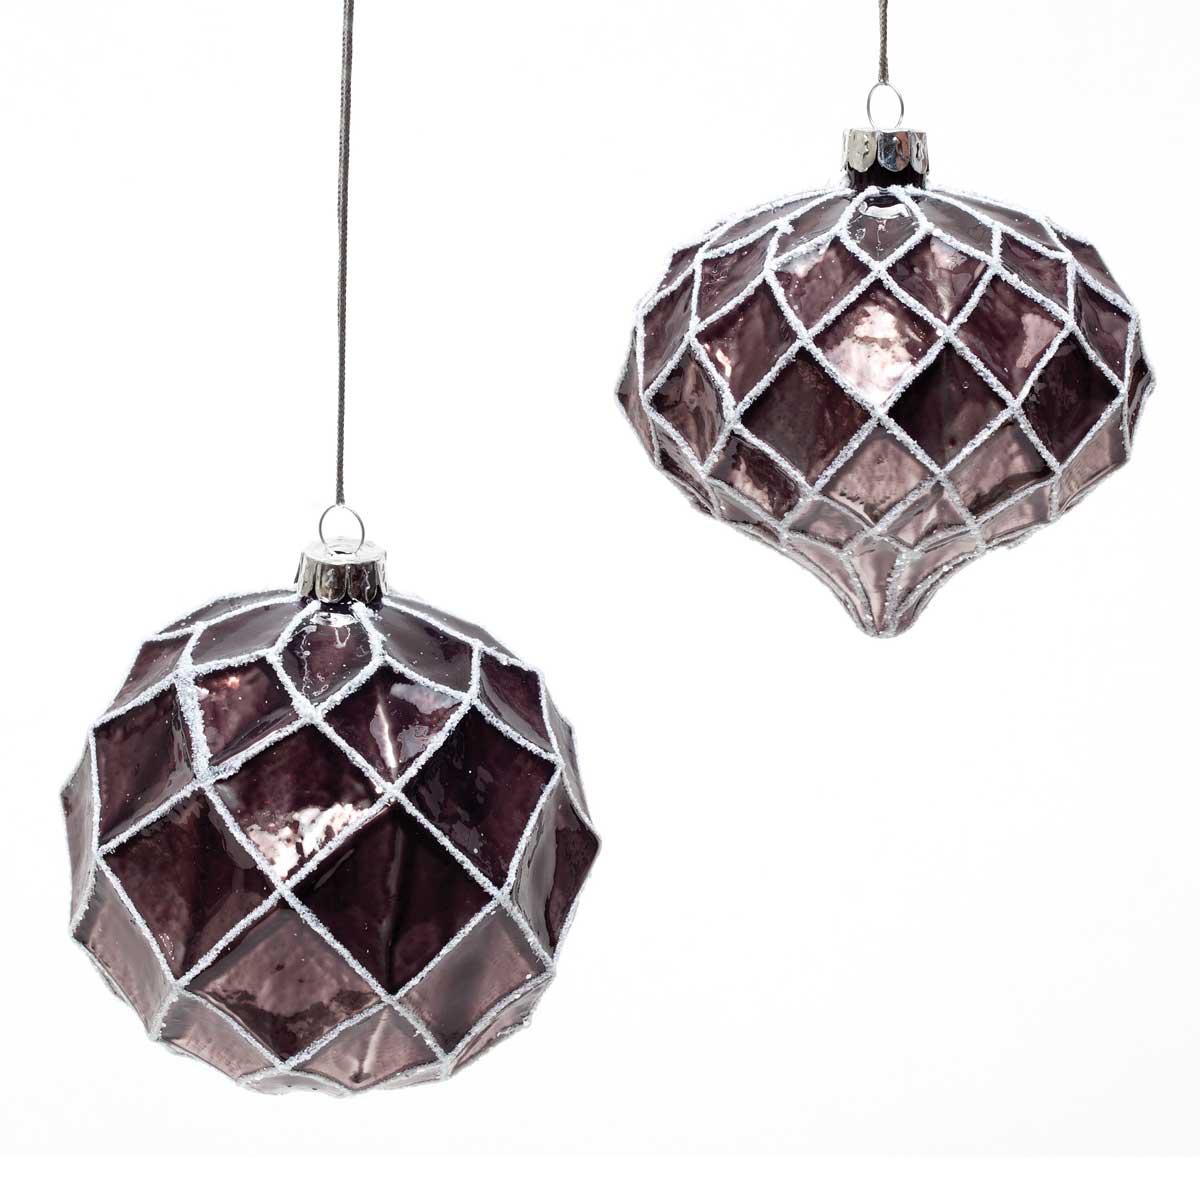 2 Piece Shiny Glass Ball/Kismet Ornament Set